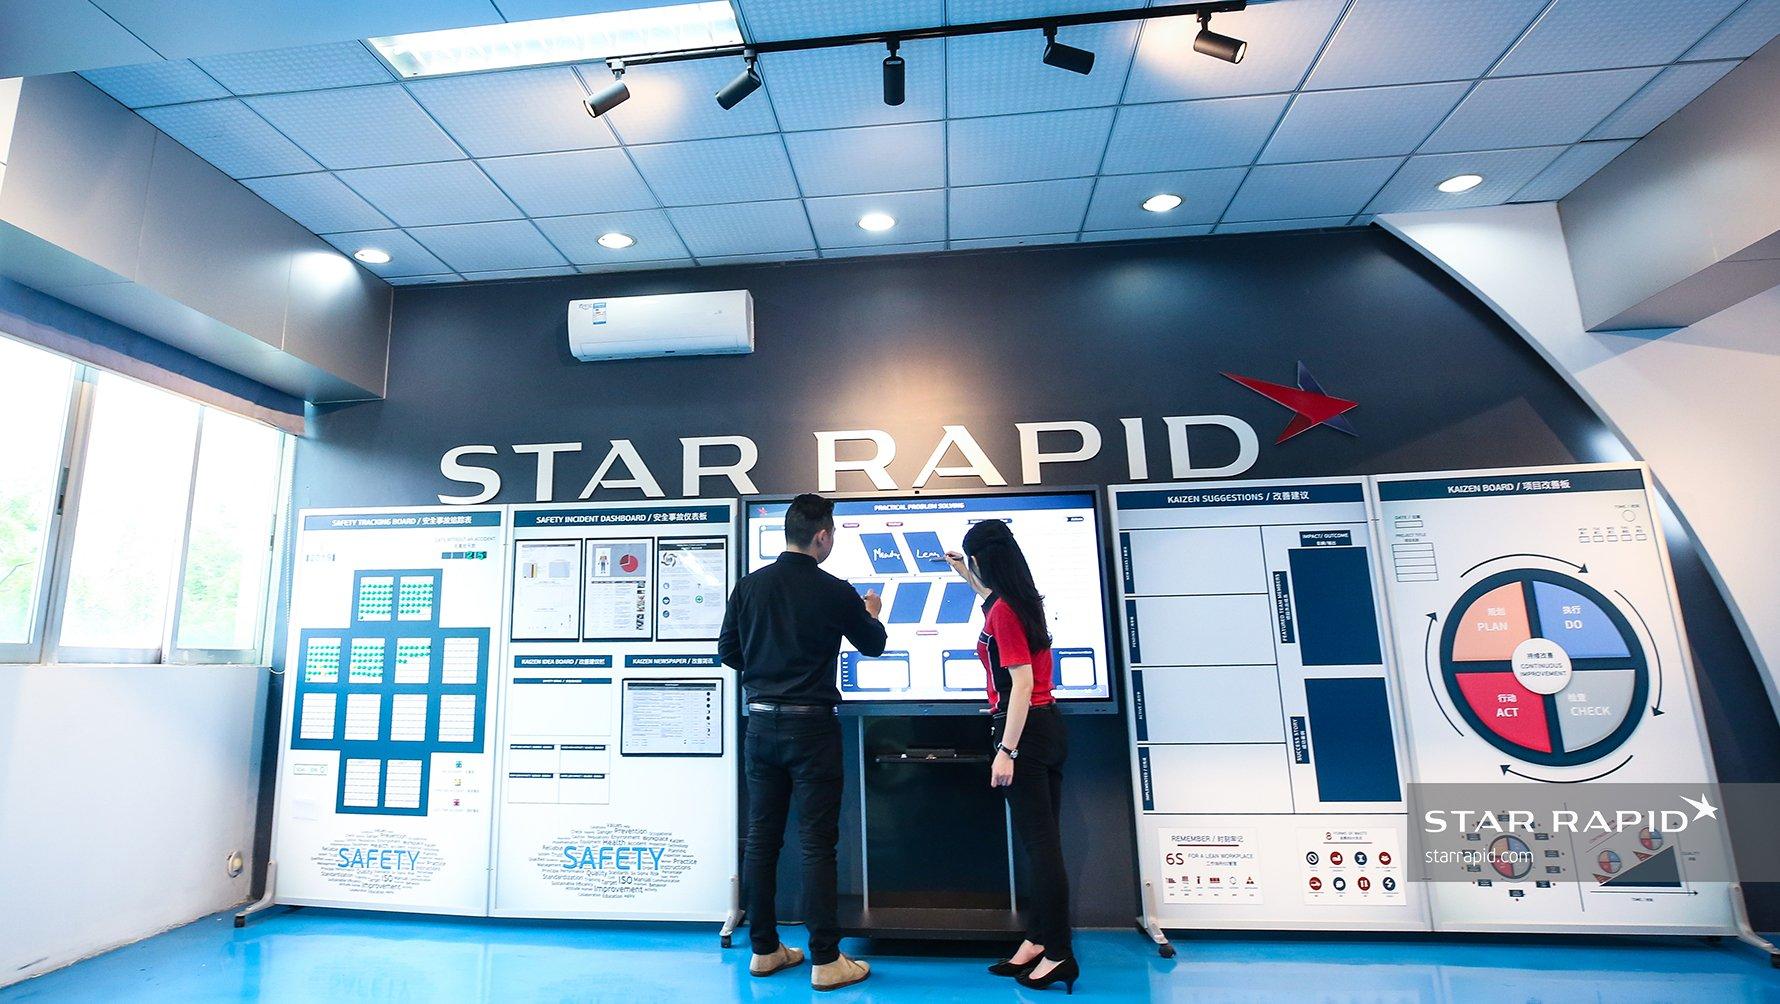 Star Rapid Manufacturing Safety Dashboard